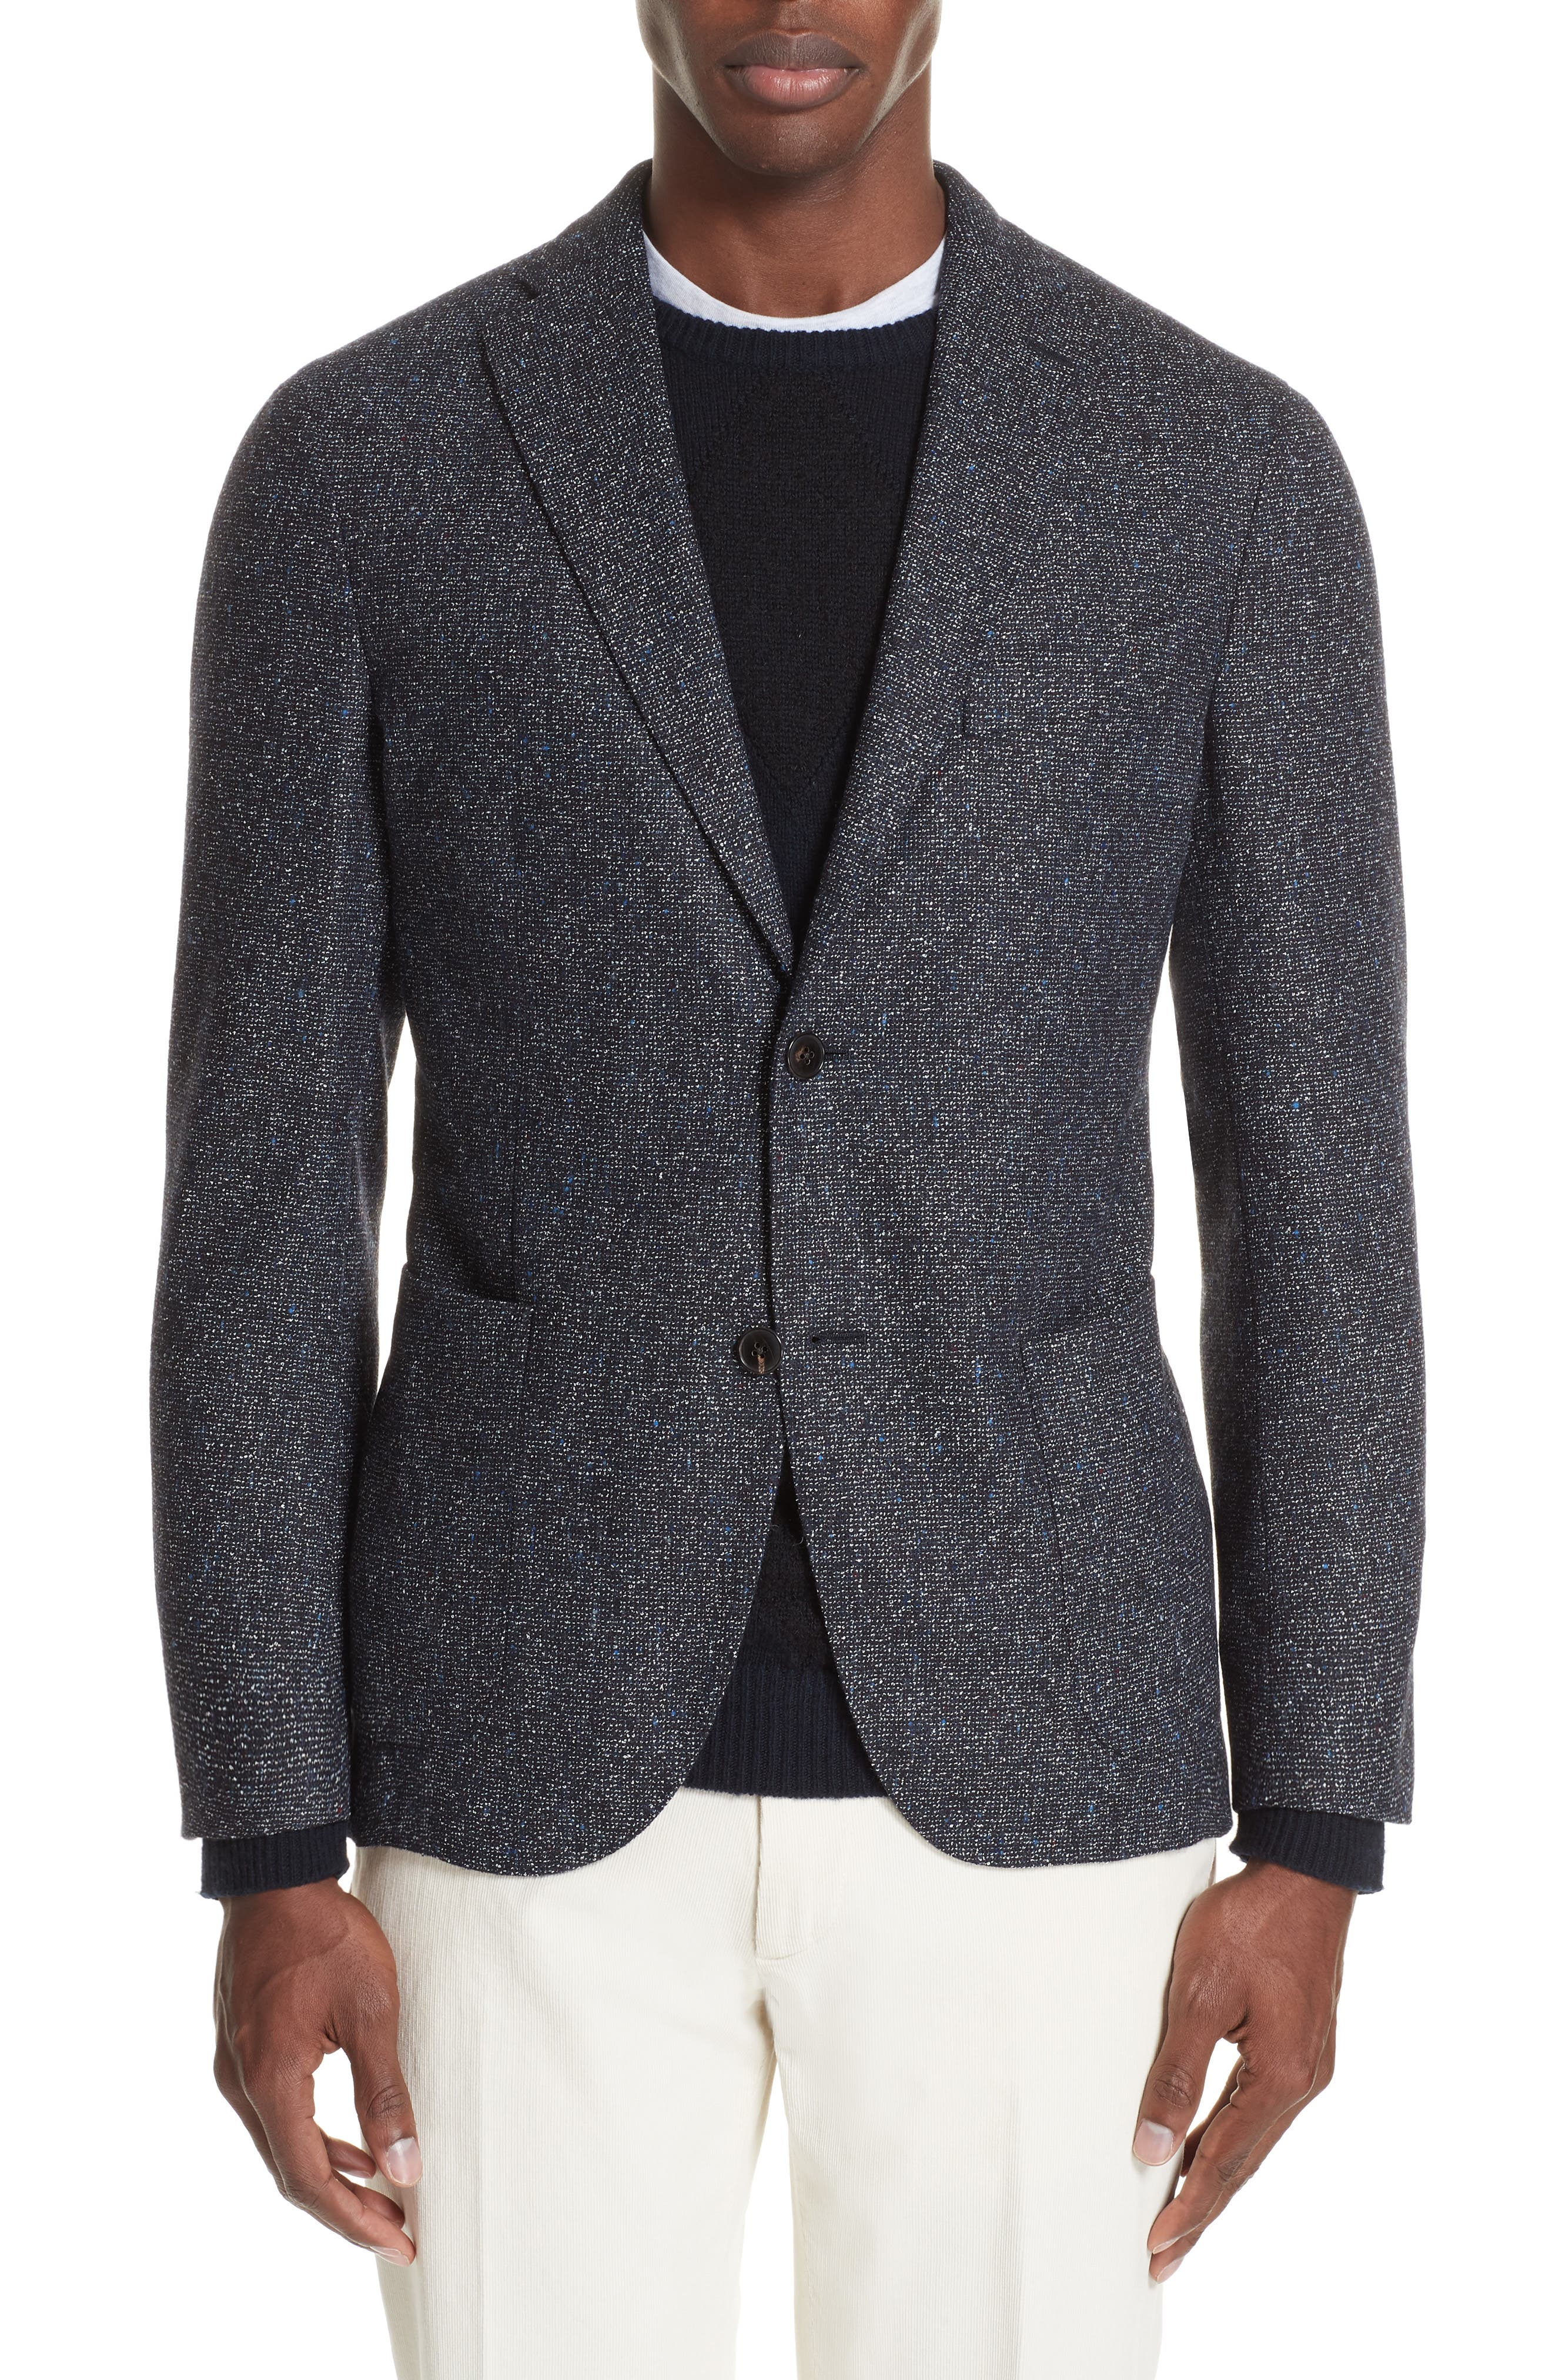 Trim Fit Tweed Wool Blend Blazer,                             Main thumbnail 1, color,                             NAVY